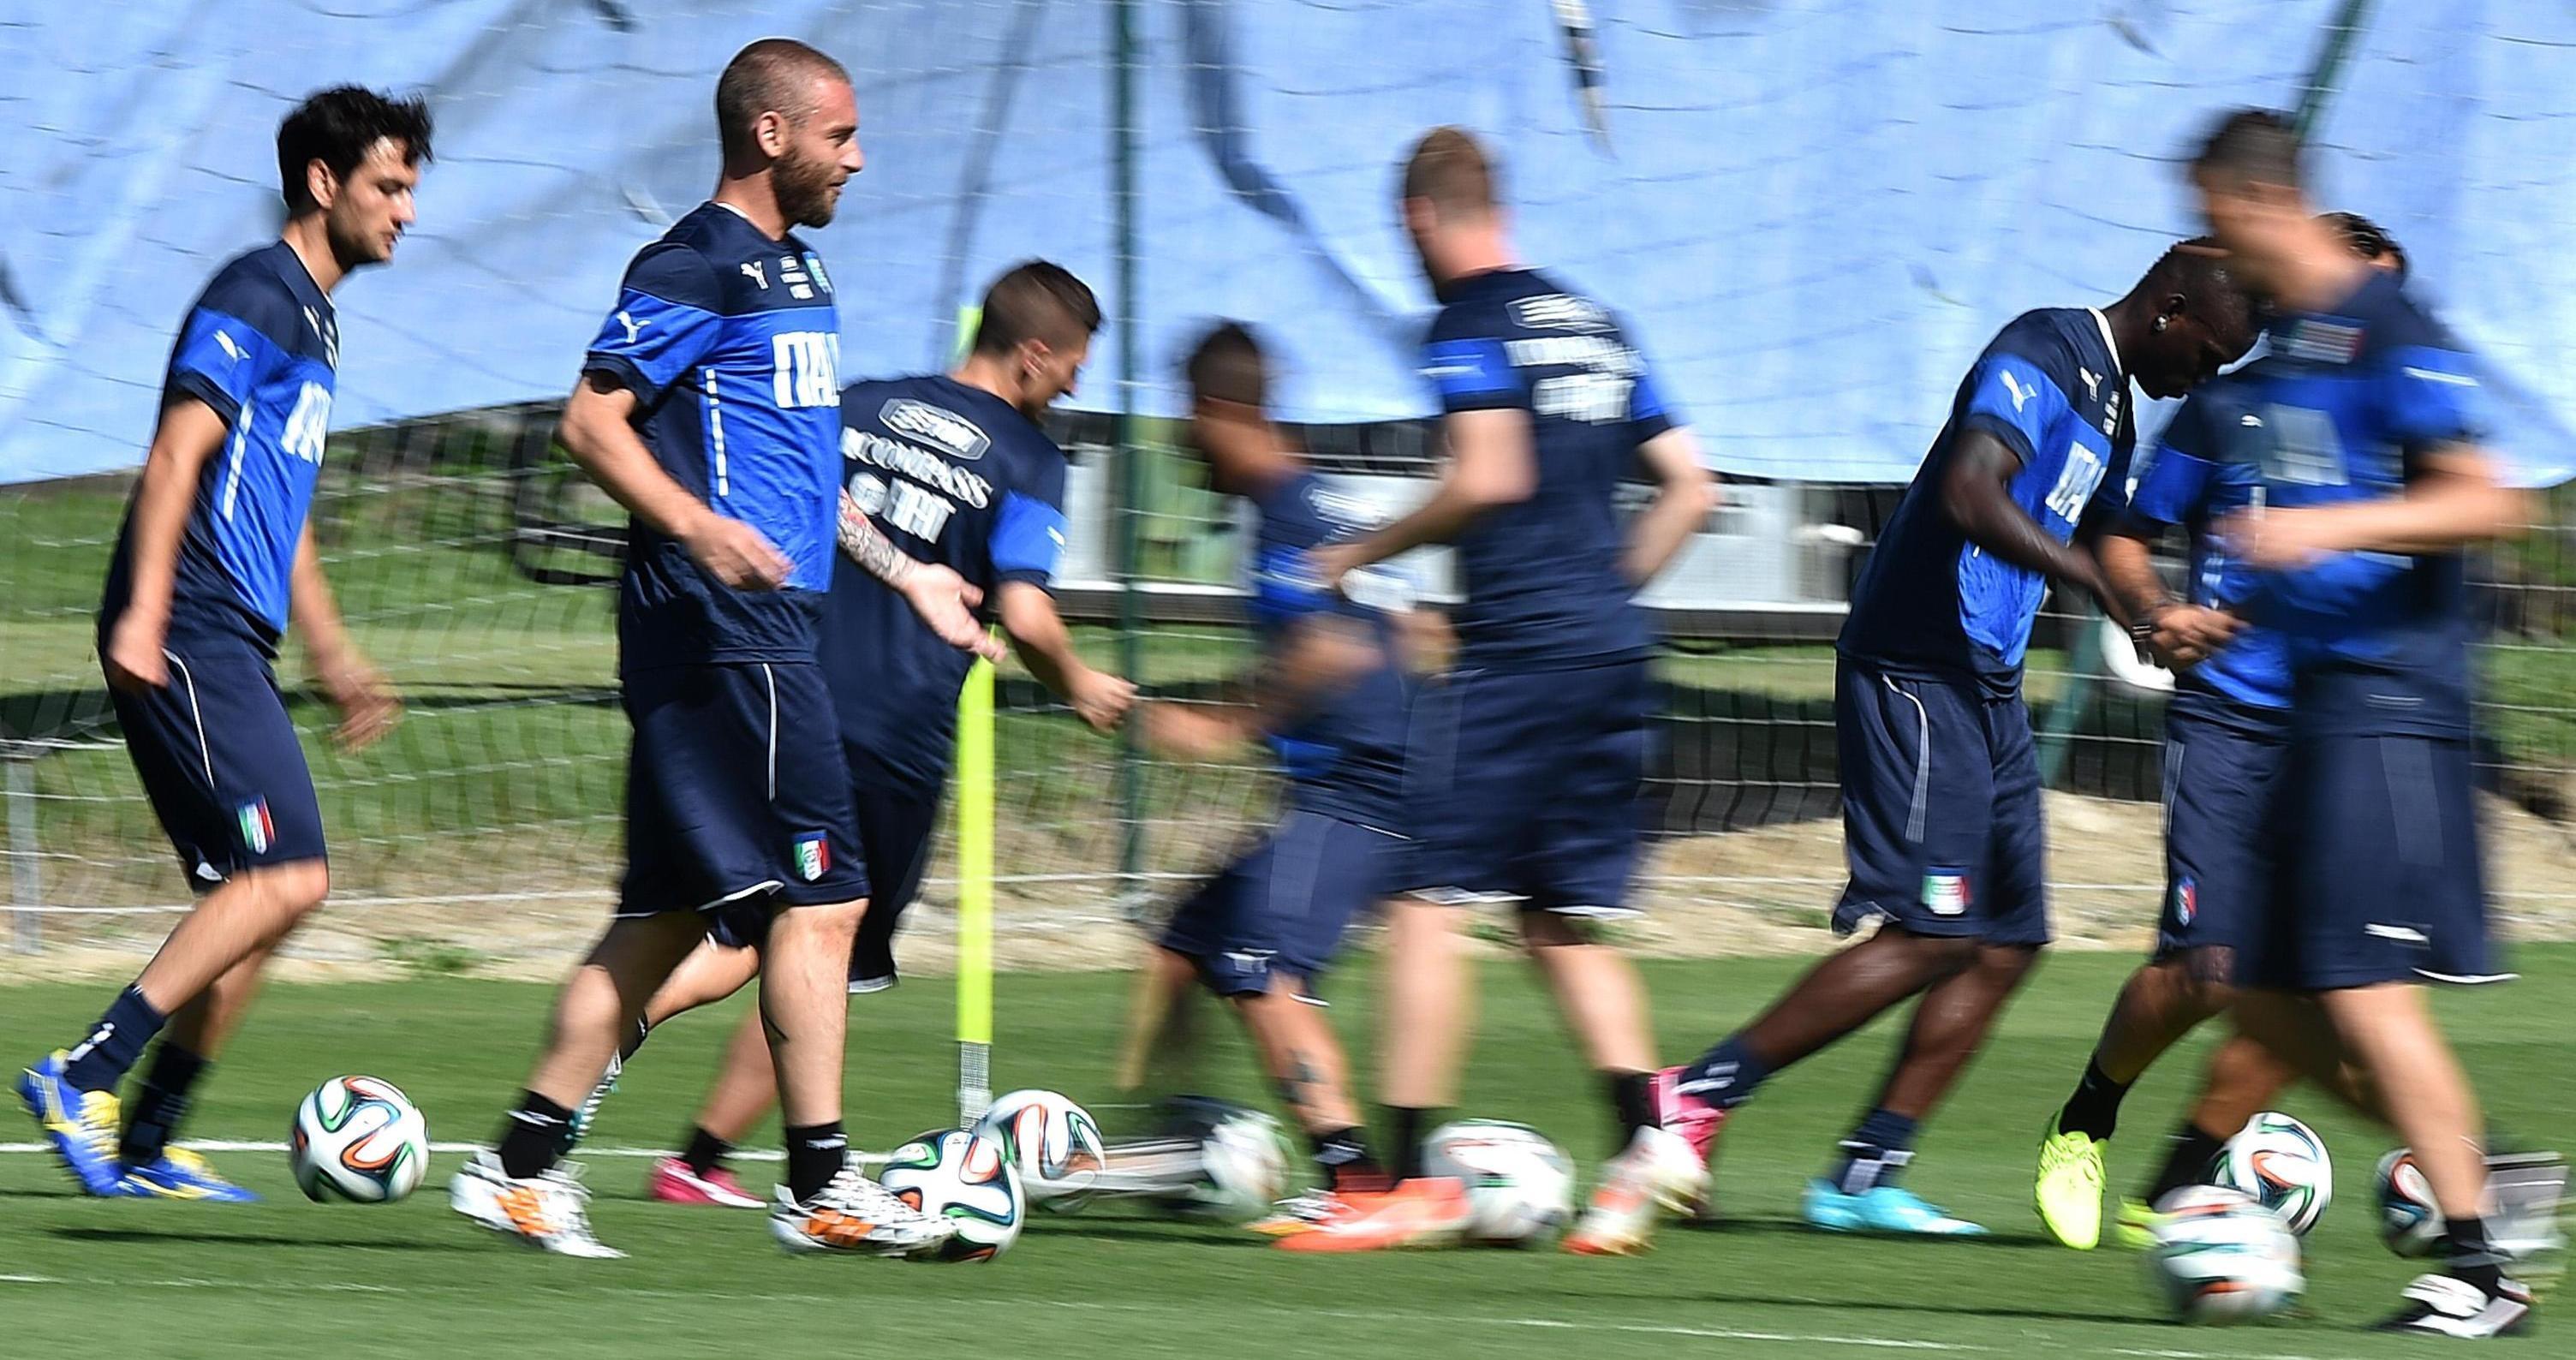 Italia ultimo allenamento a Racife